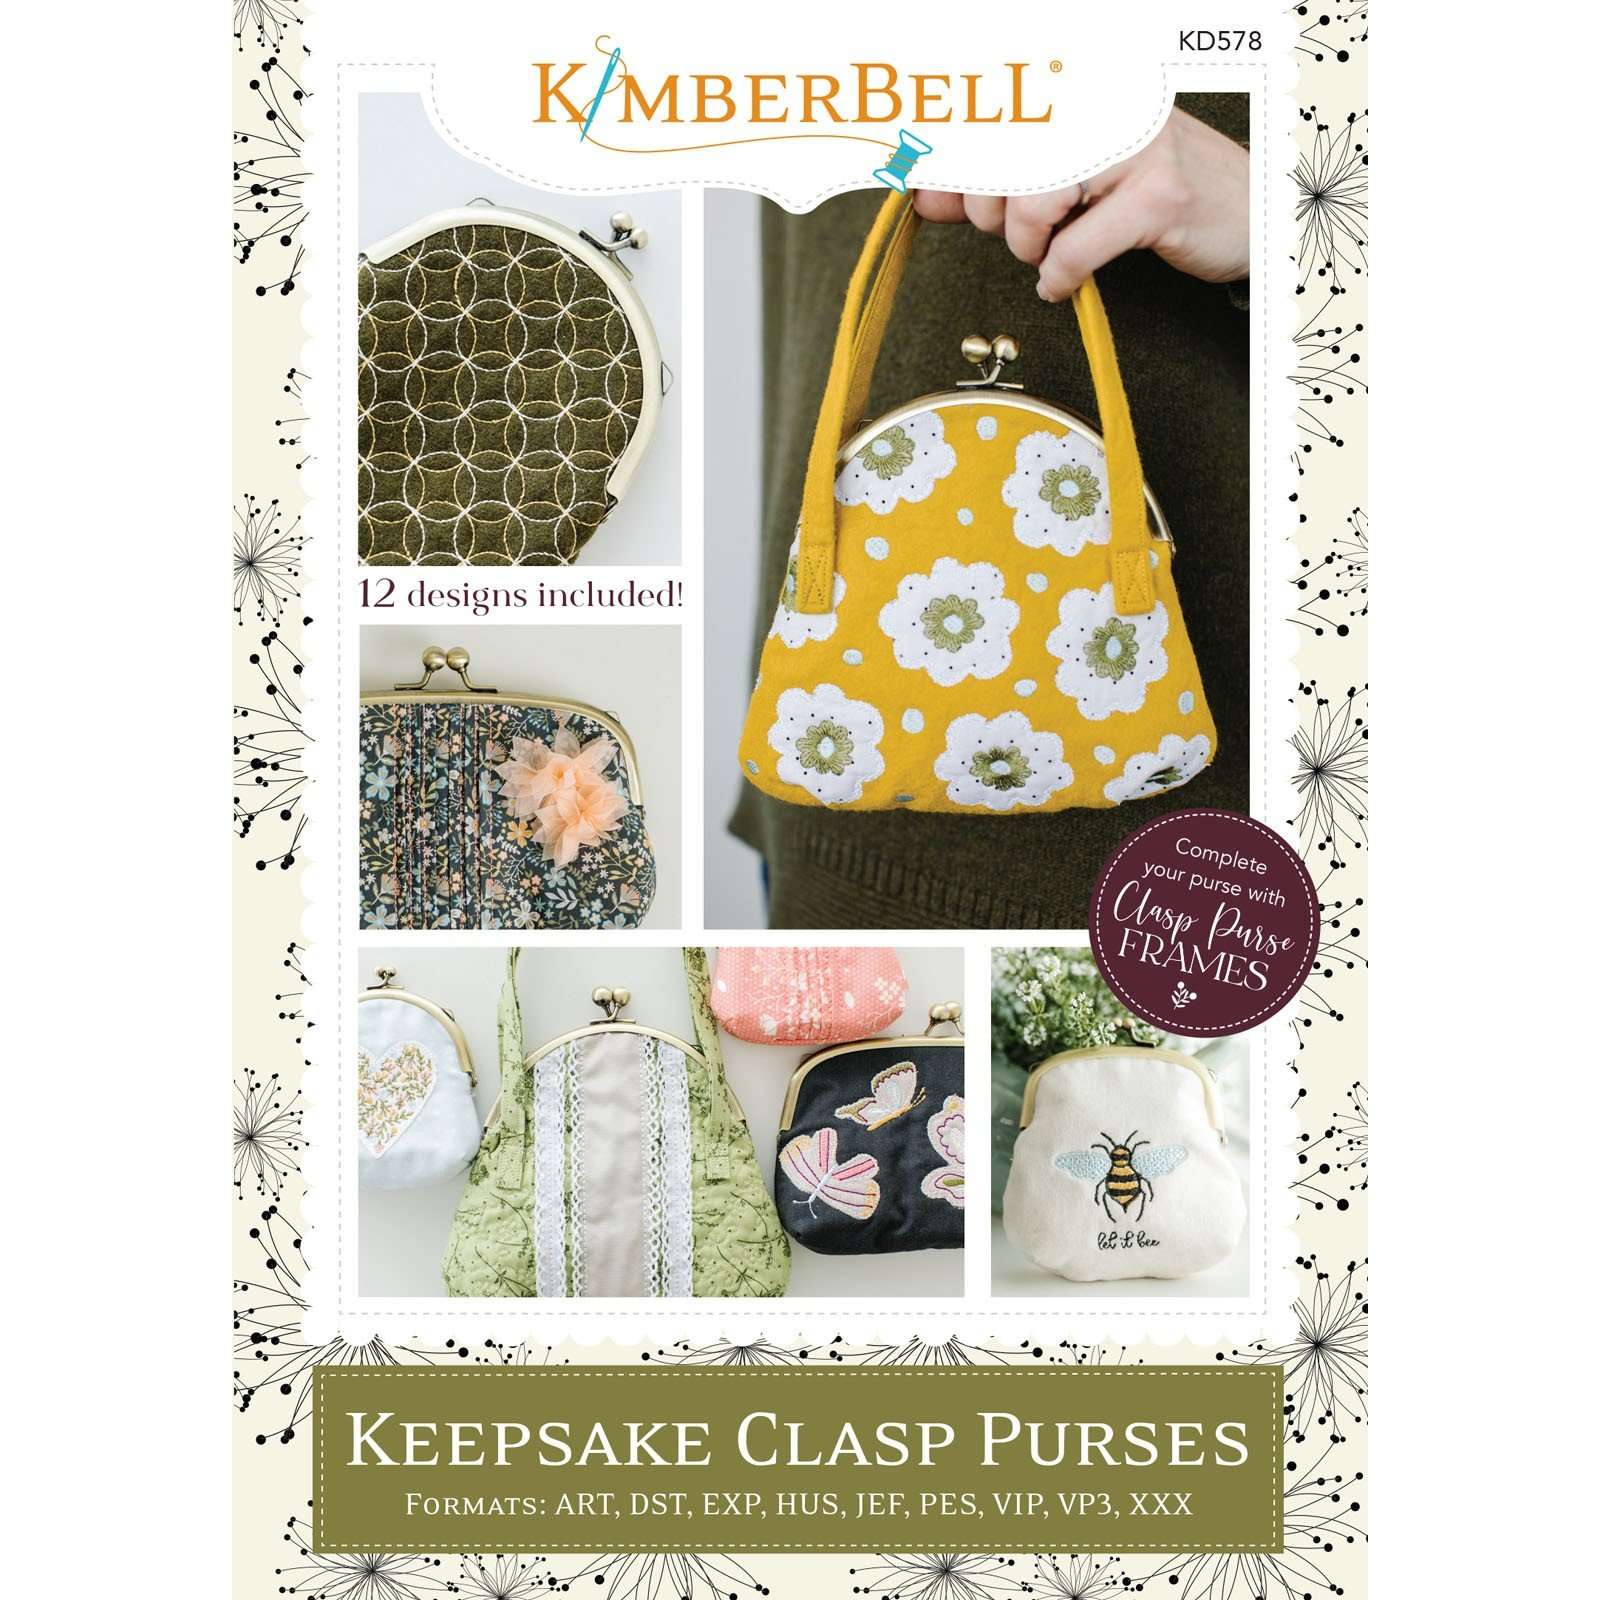 Keepsake Clasp Purses (Embroidery CD) by Kimberbell